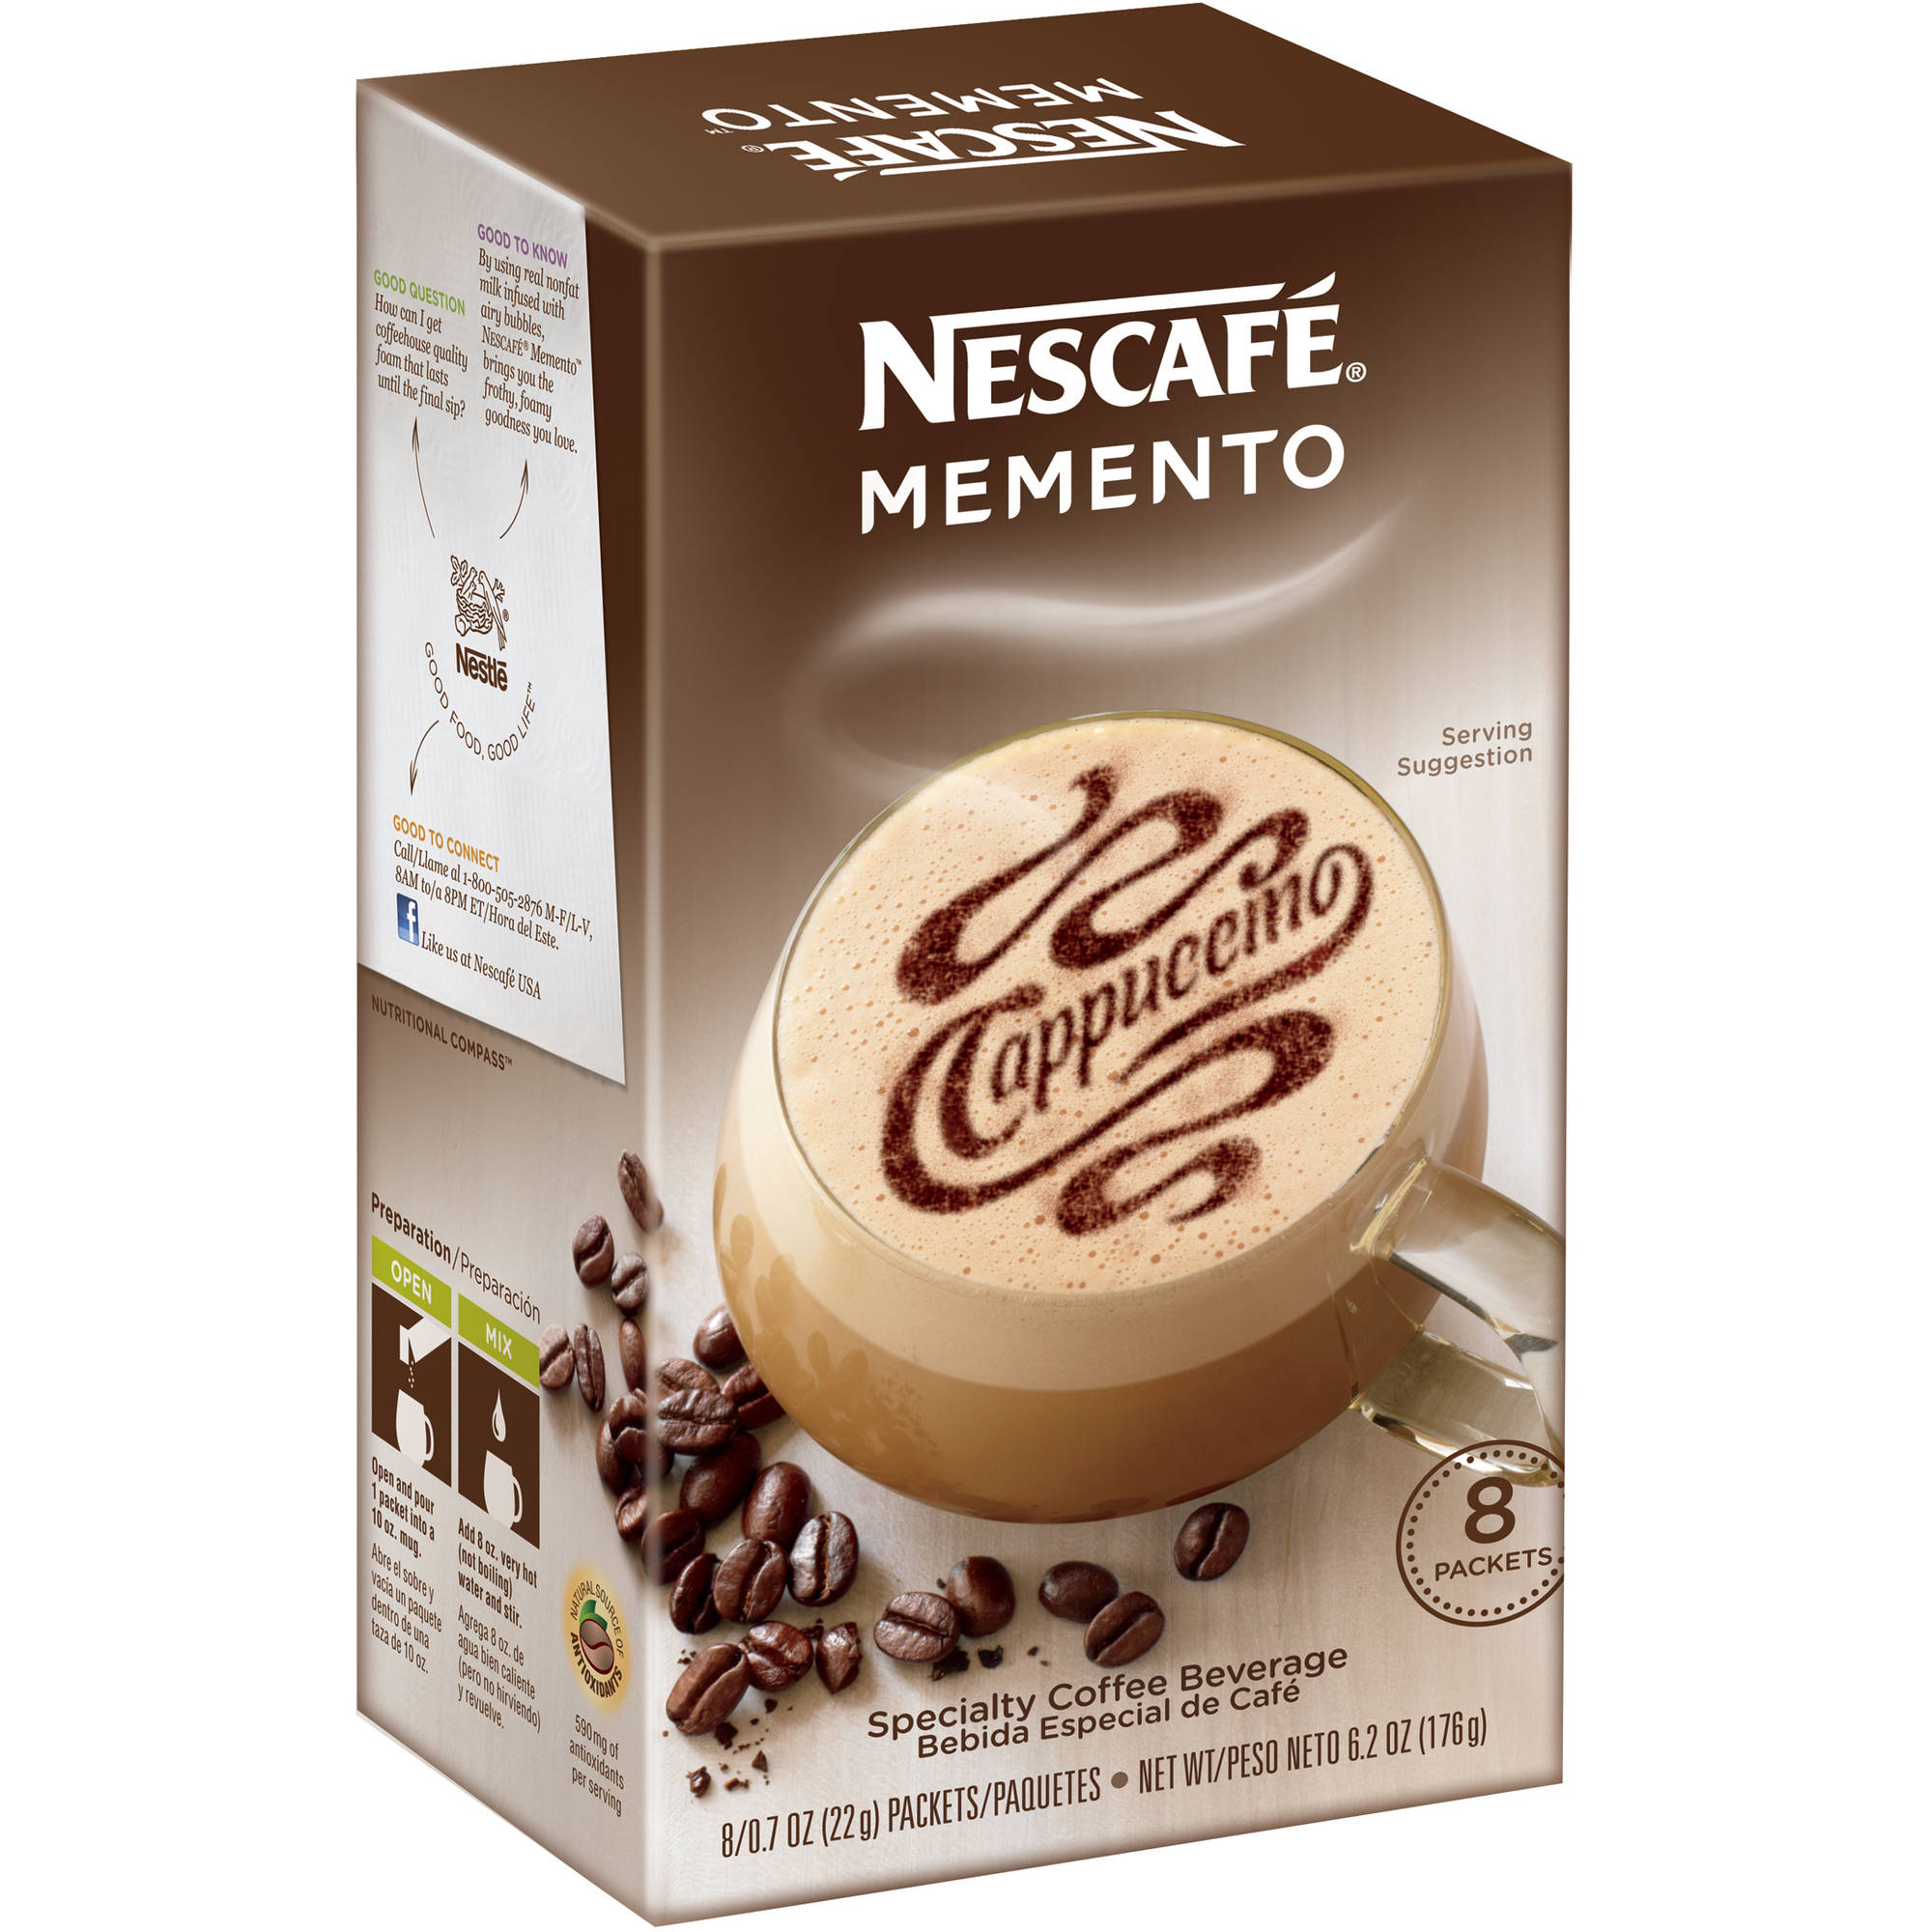 Nestle Nescafe Memento Cappuccino, 8 ea